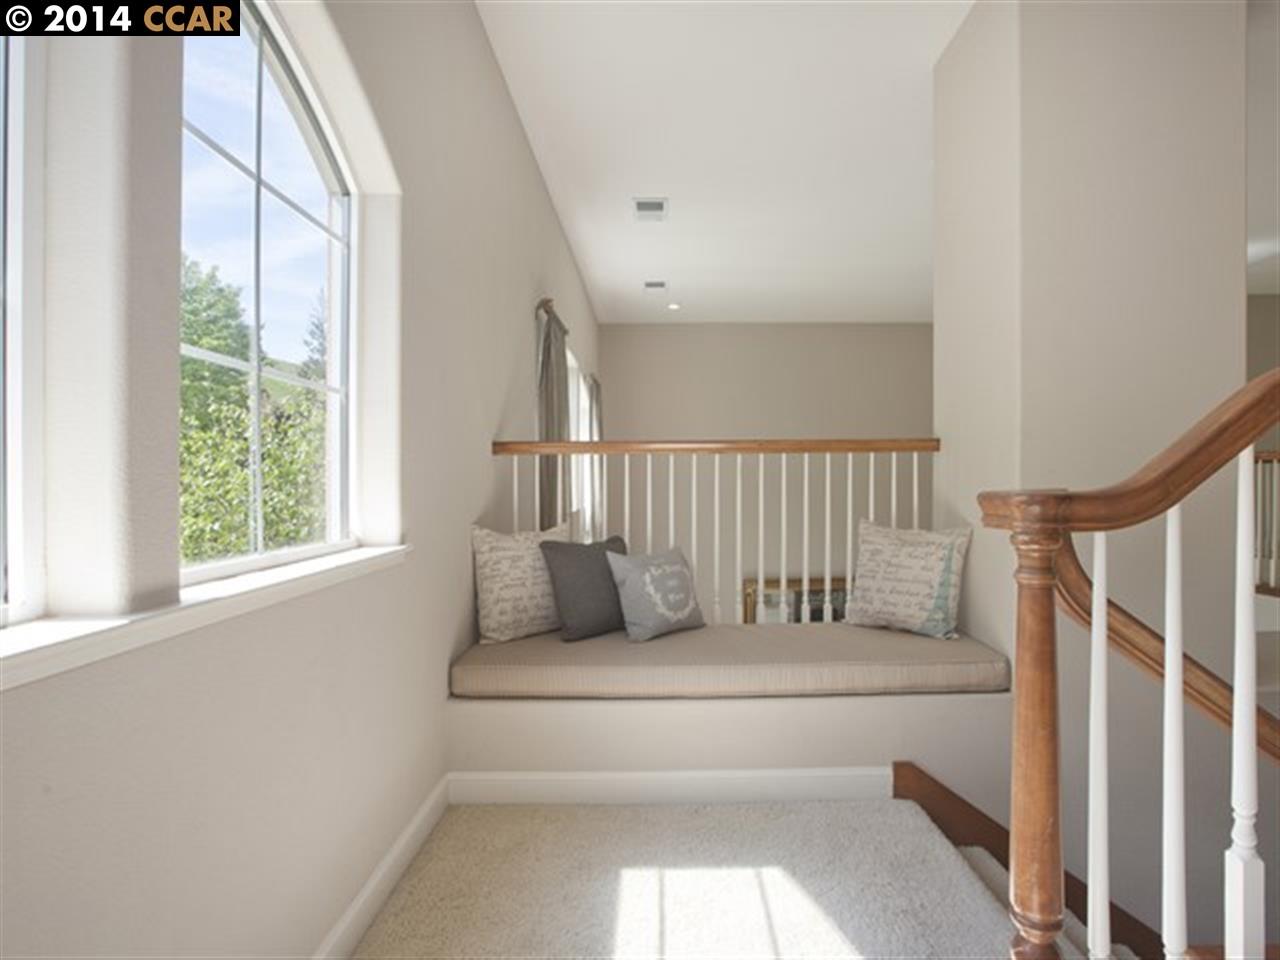 Additional photo for property listing at 1590 SERAFIX Road  Alamo, California 94507 Estados Unidos